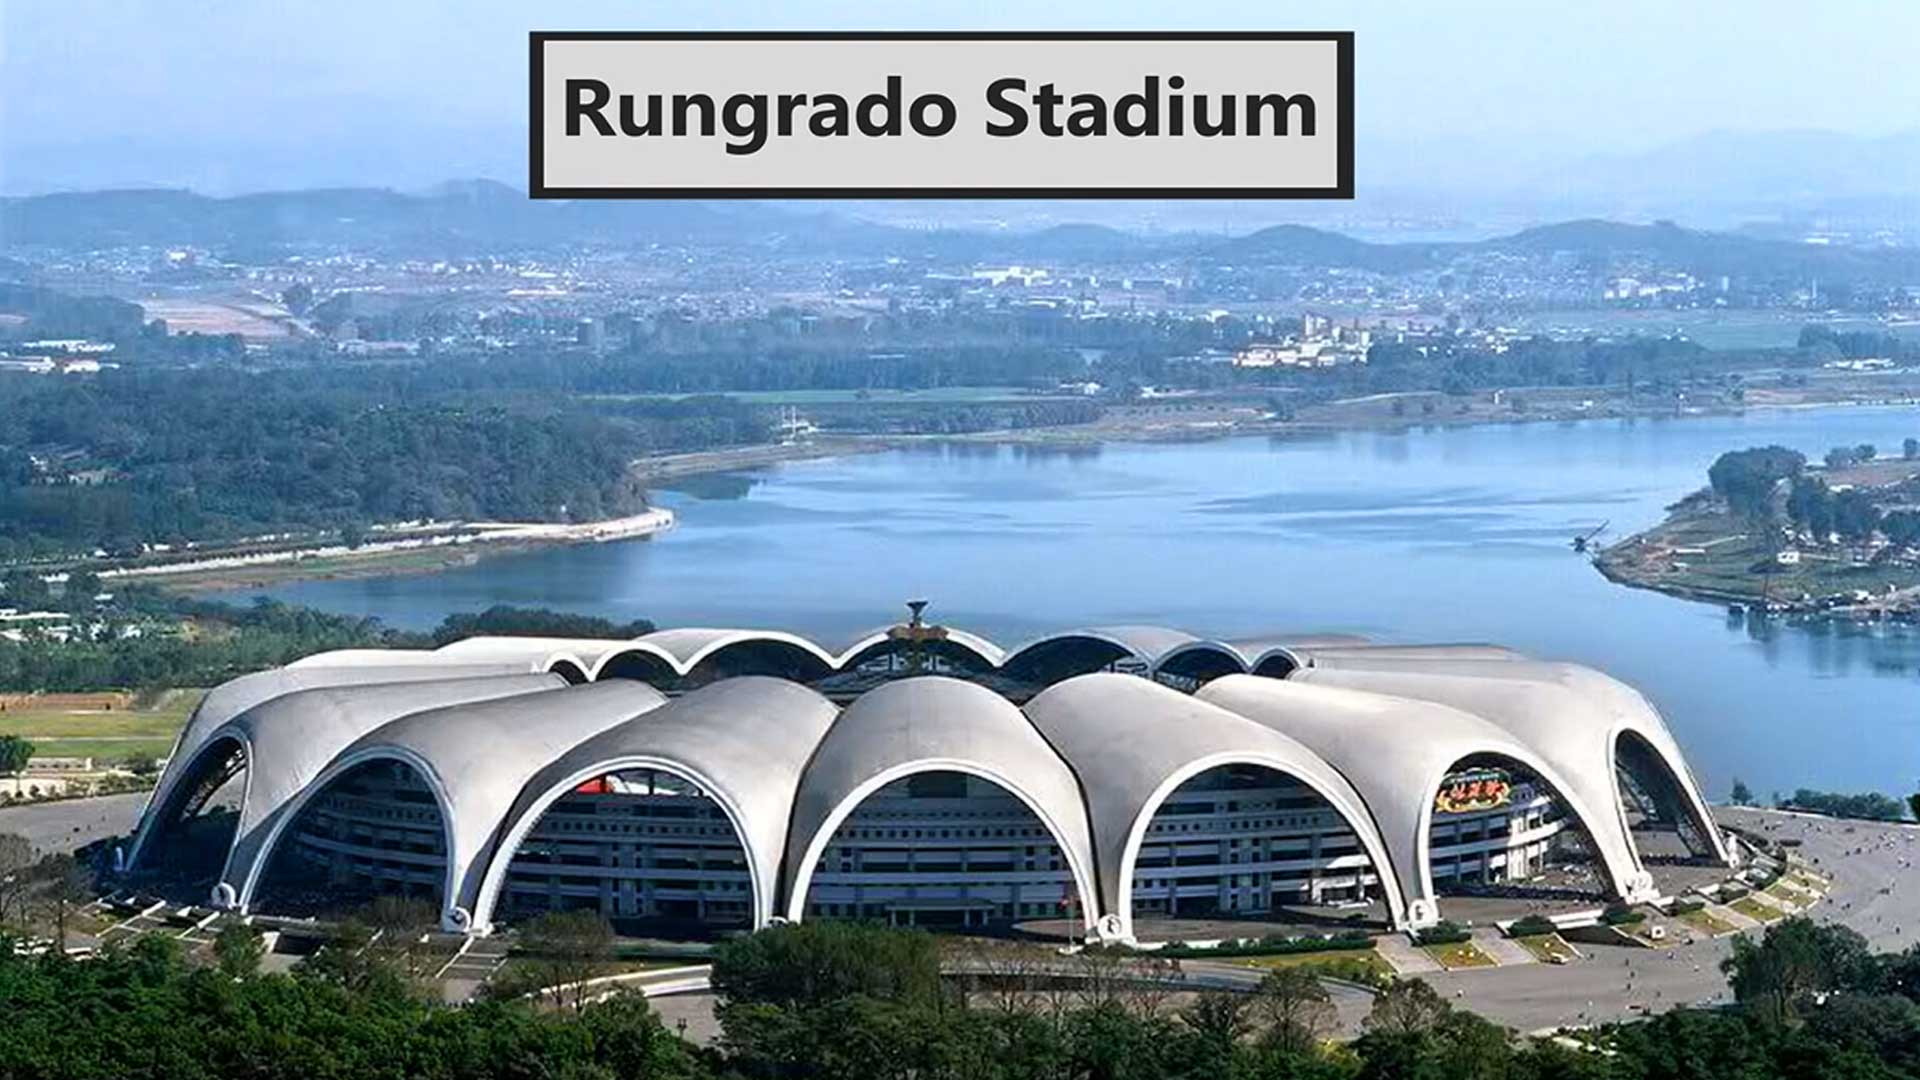 Rungrado Stadium in Pyongyang